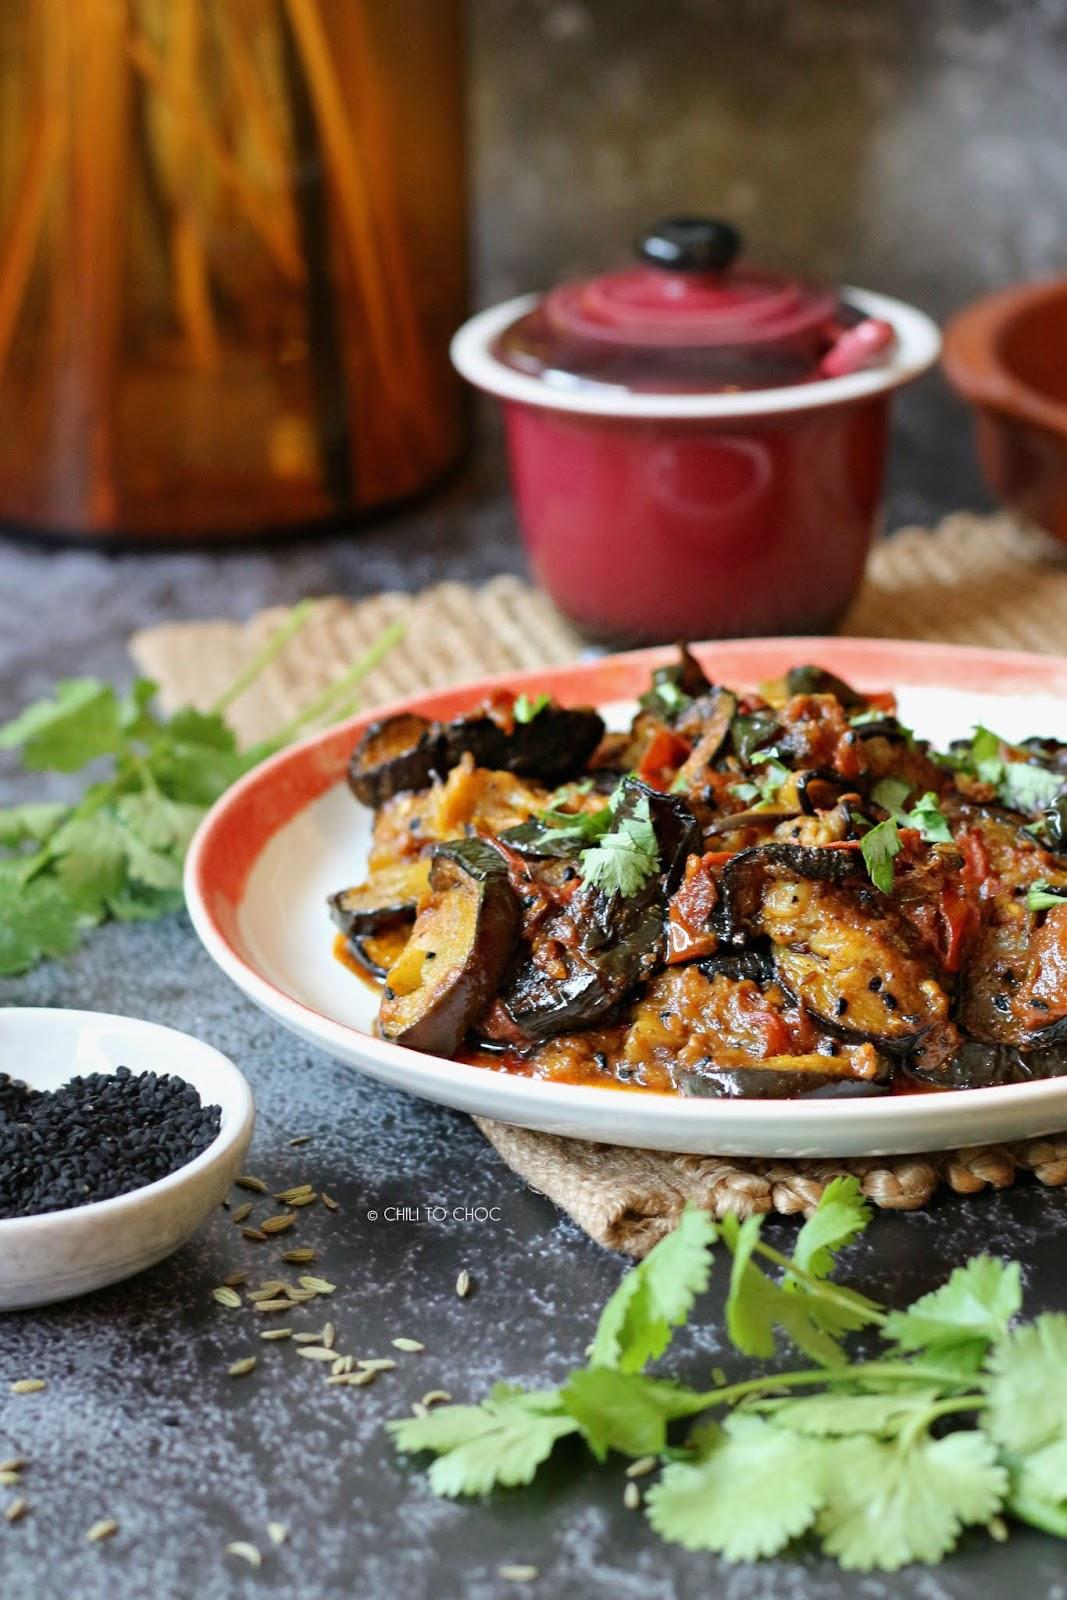 Recipe - Achari Baingan (Eggplant with Pickling Spices)